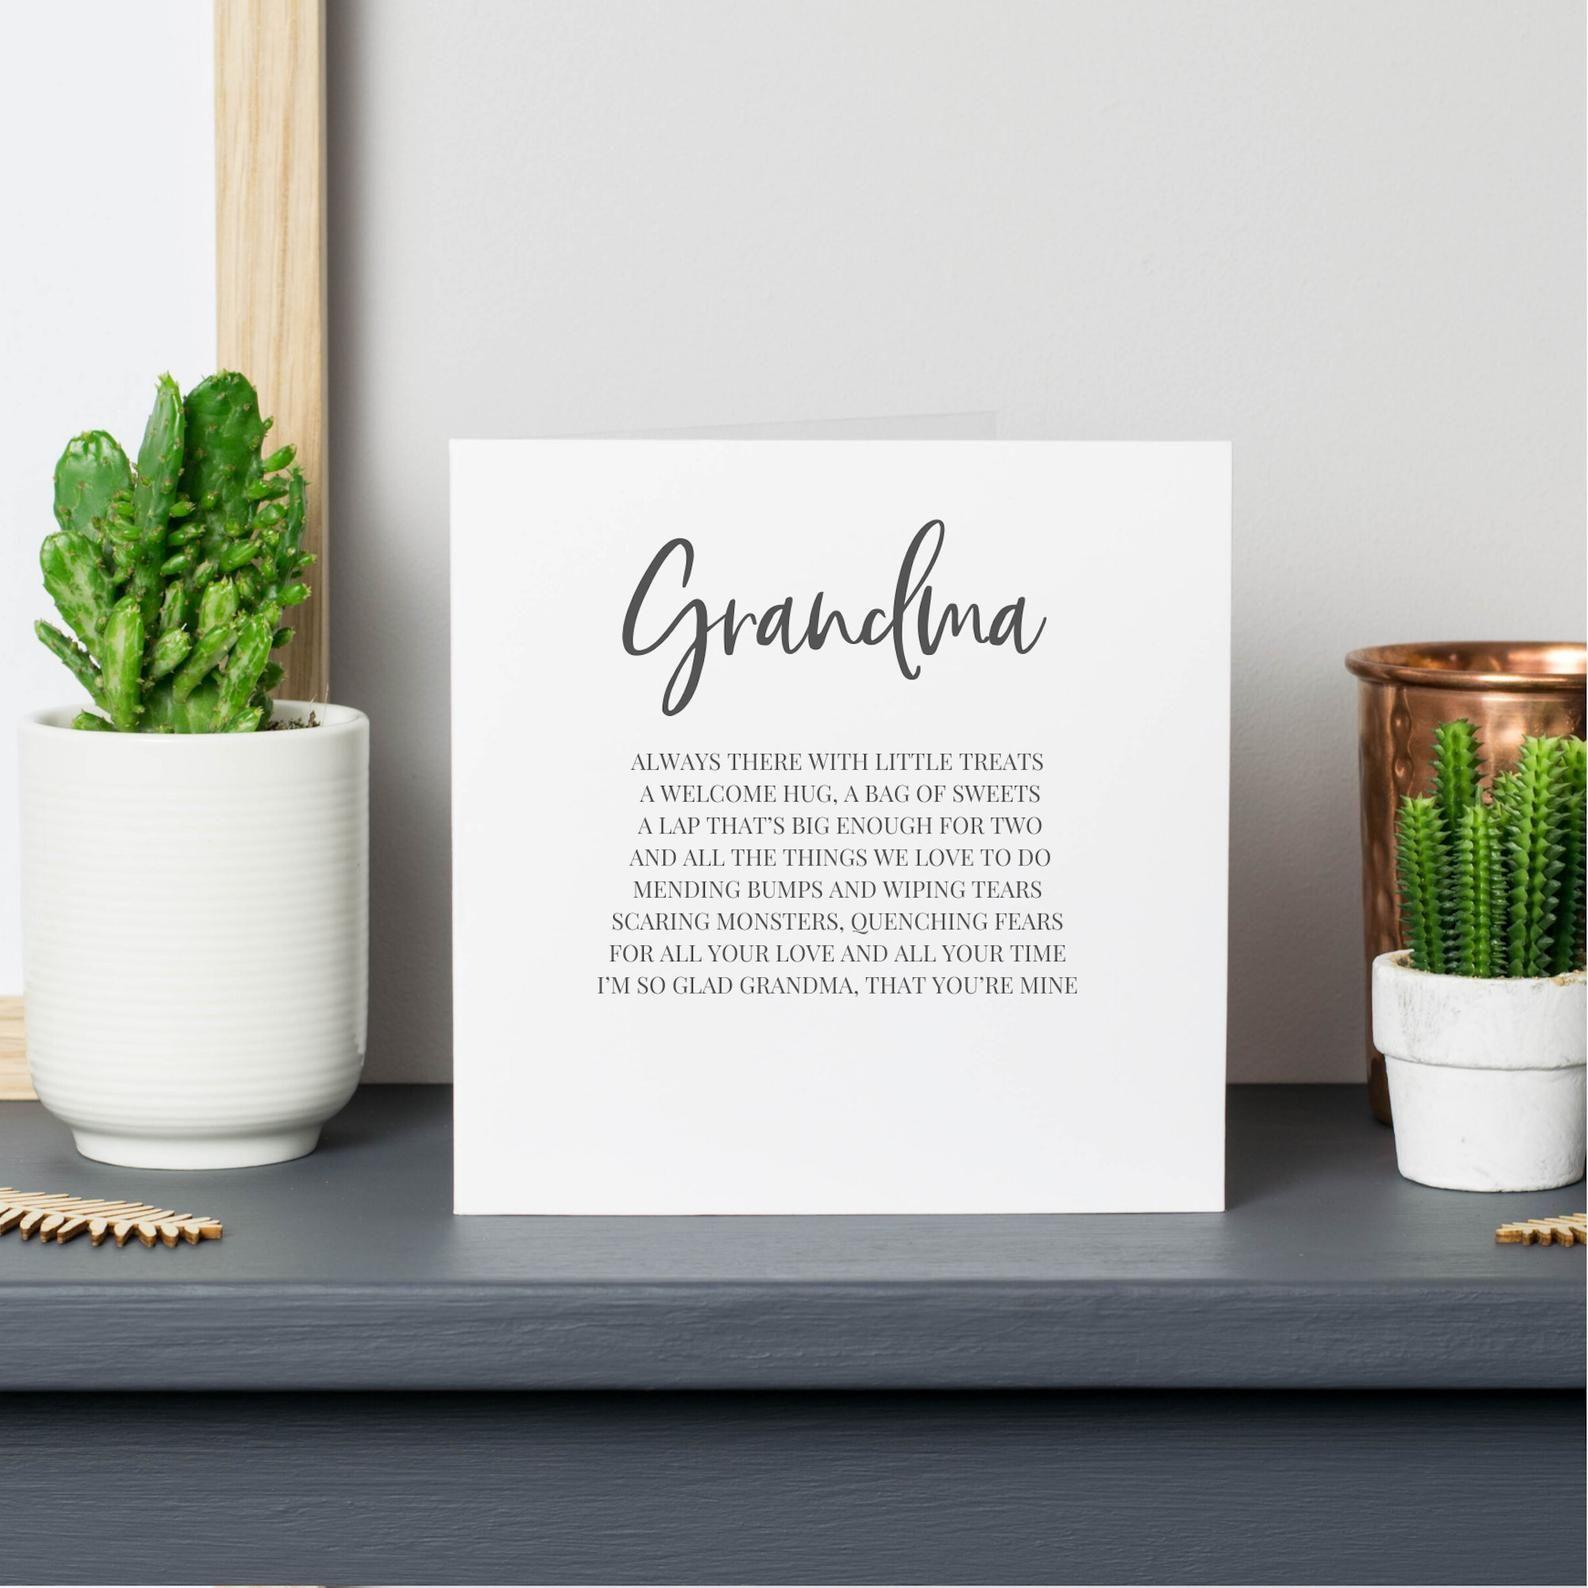 Grandma card card for grandma mothers day card grandma